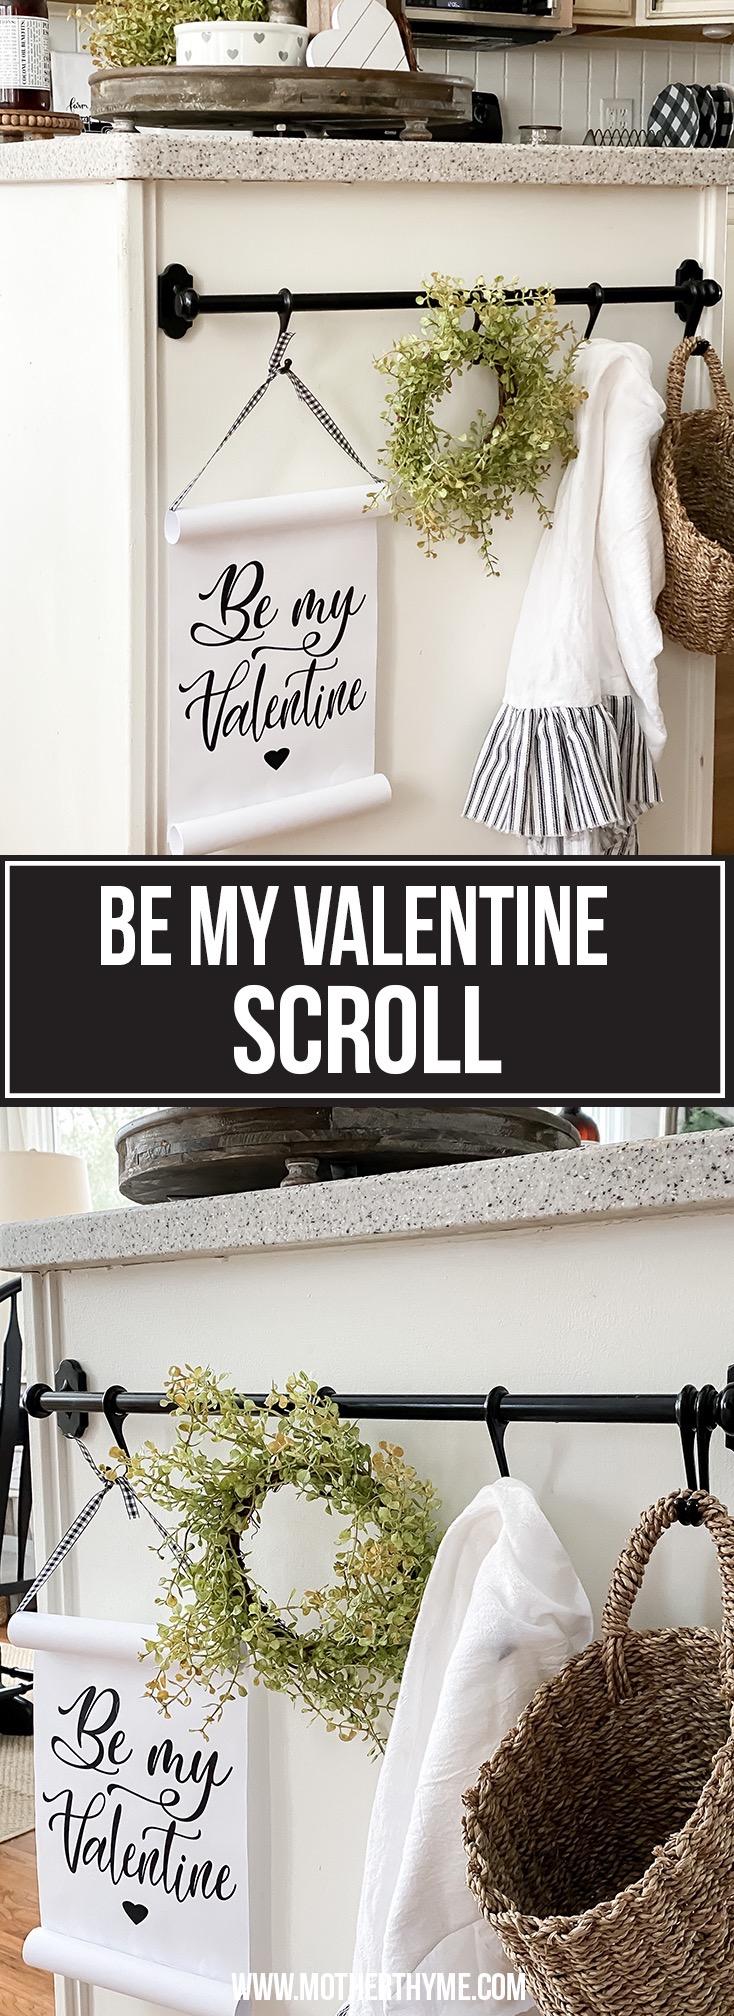 BE MY VALENTINE SCROLL - FREE PRINTABLE